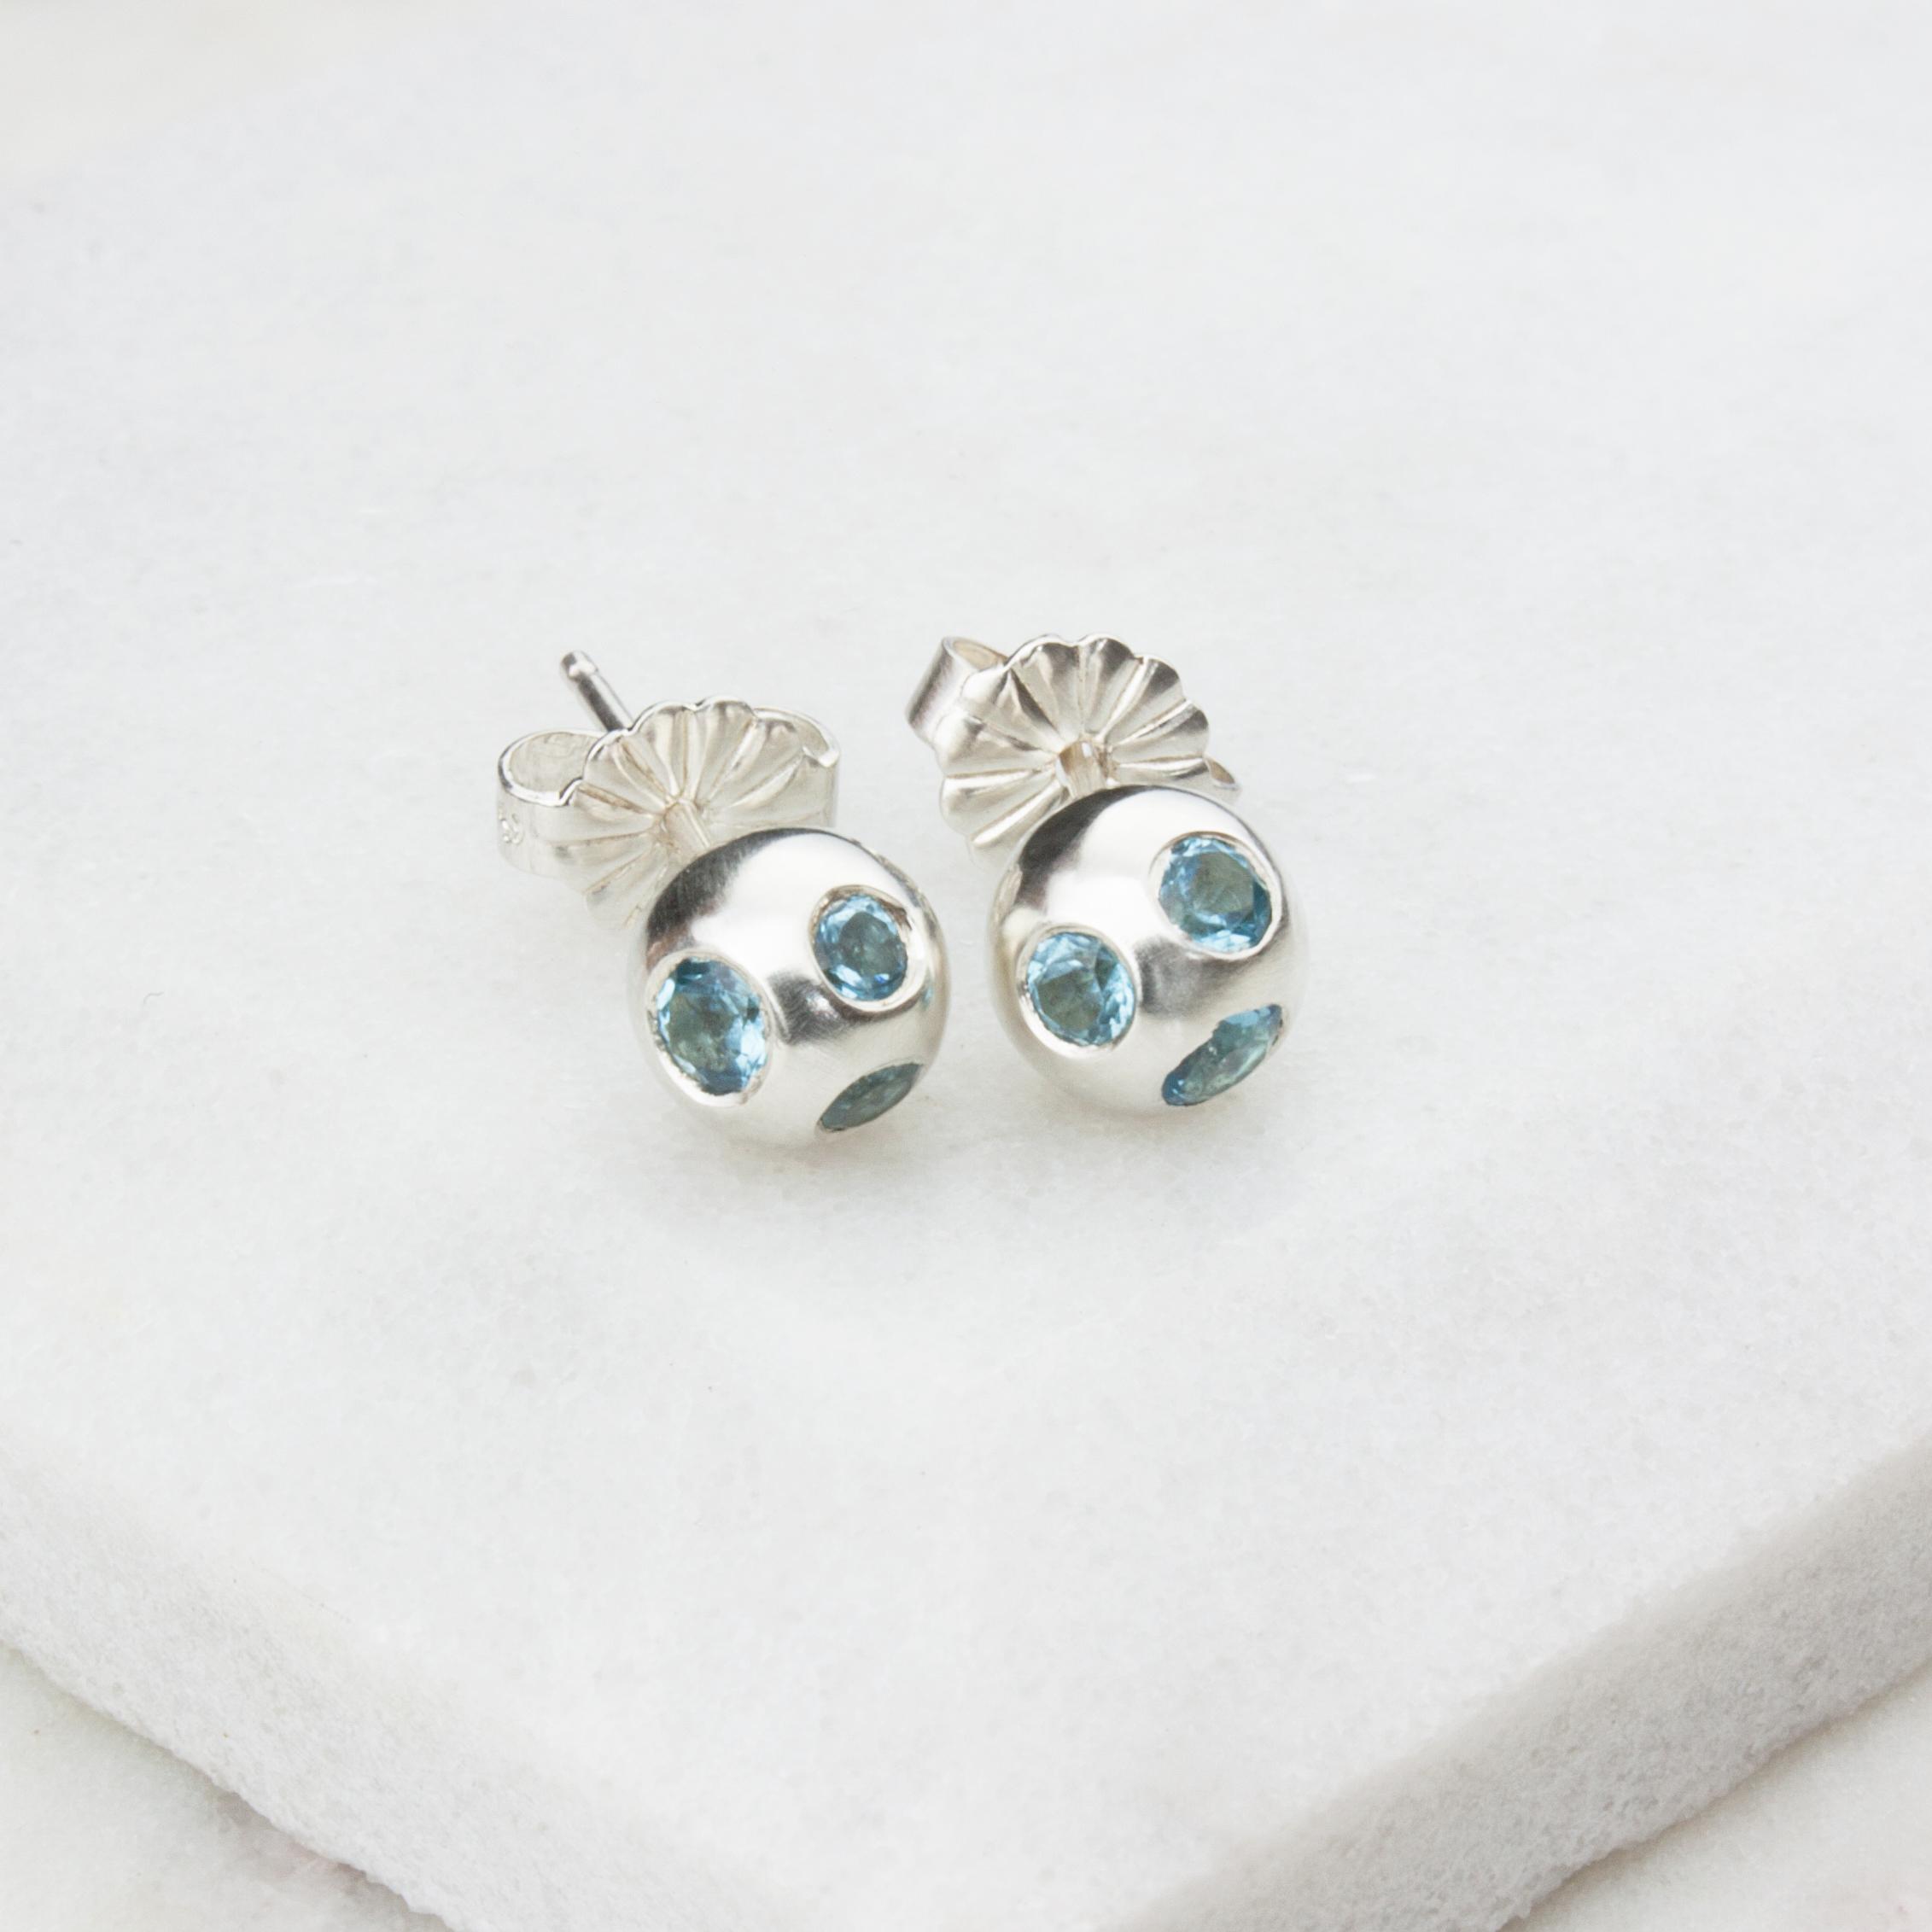 silver-orb-studs-with-blue-topaz.jpg